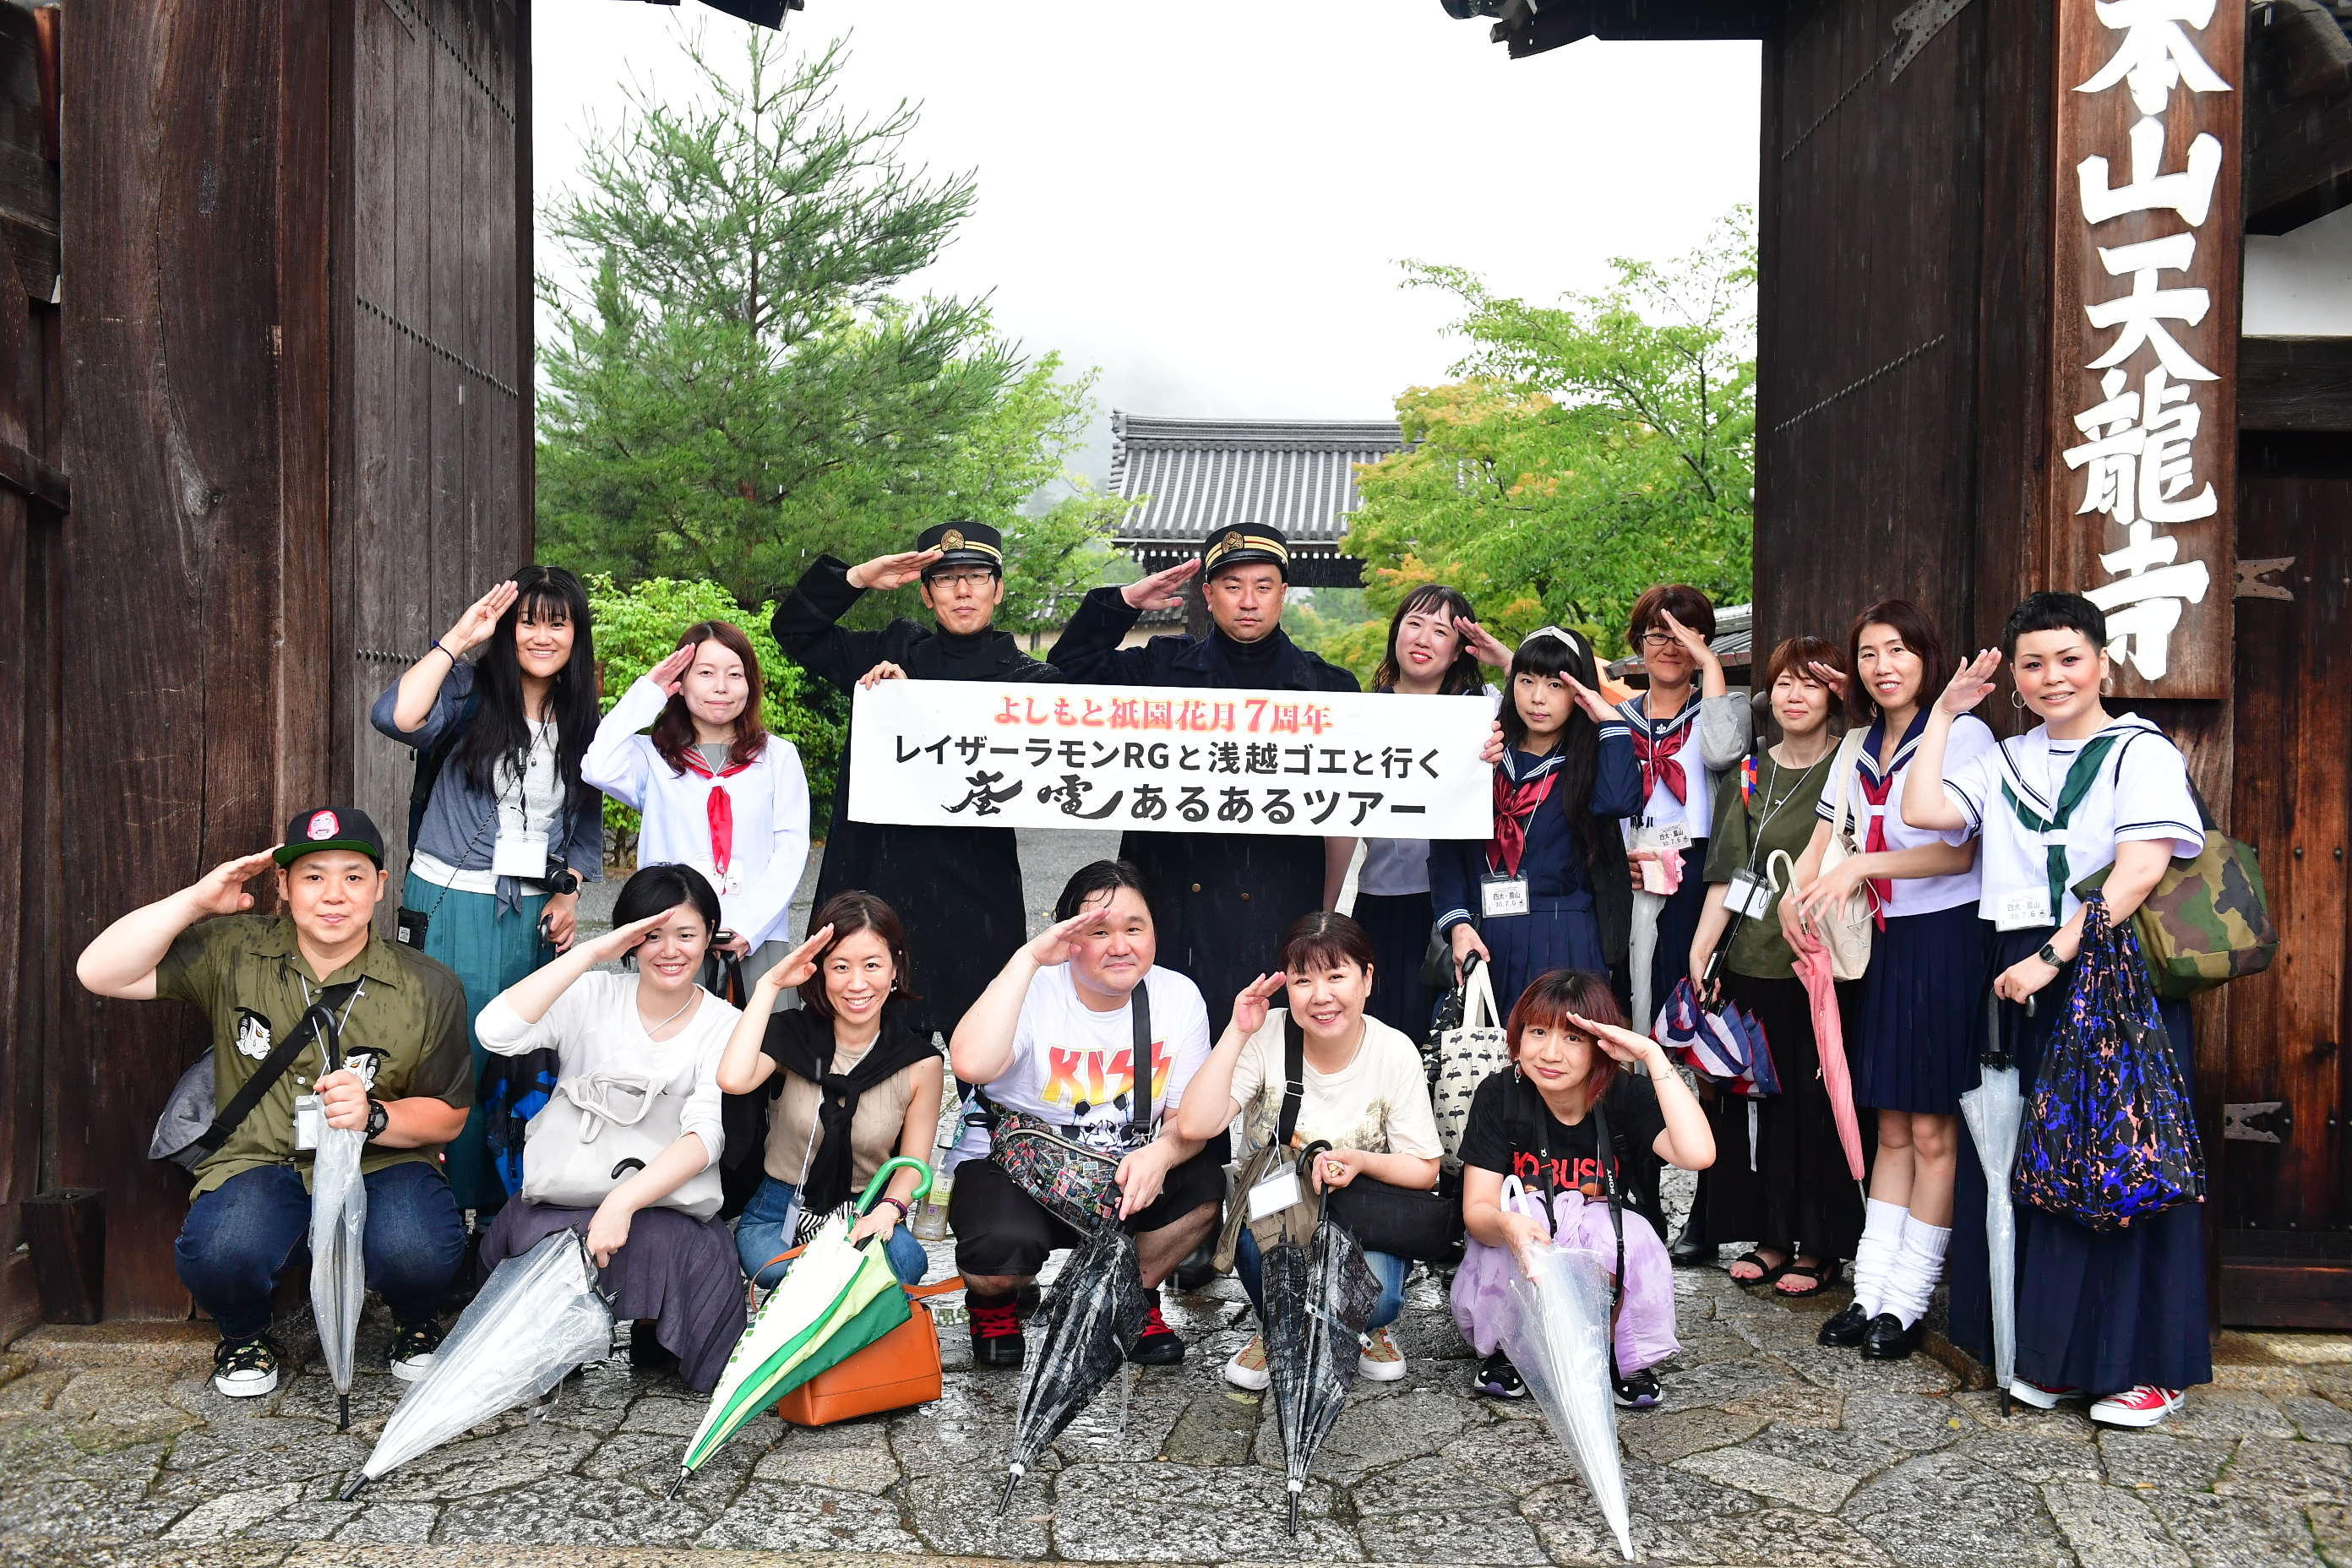 http://news.yoshimoto.co.jp/20180709145729-de1a48d7d9418b084d53dff4185ed9ef33d35c12.jpg